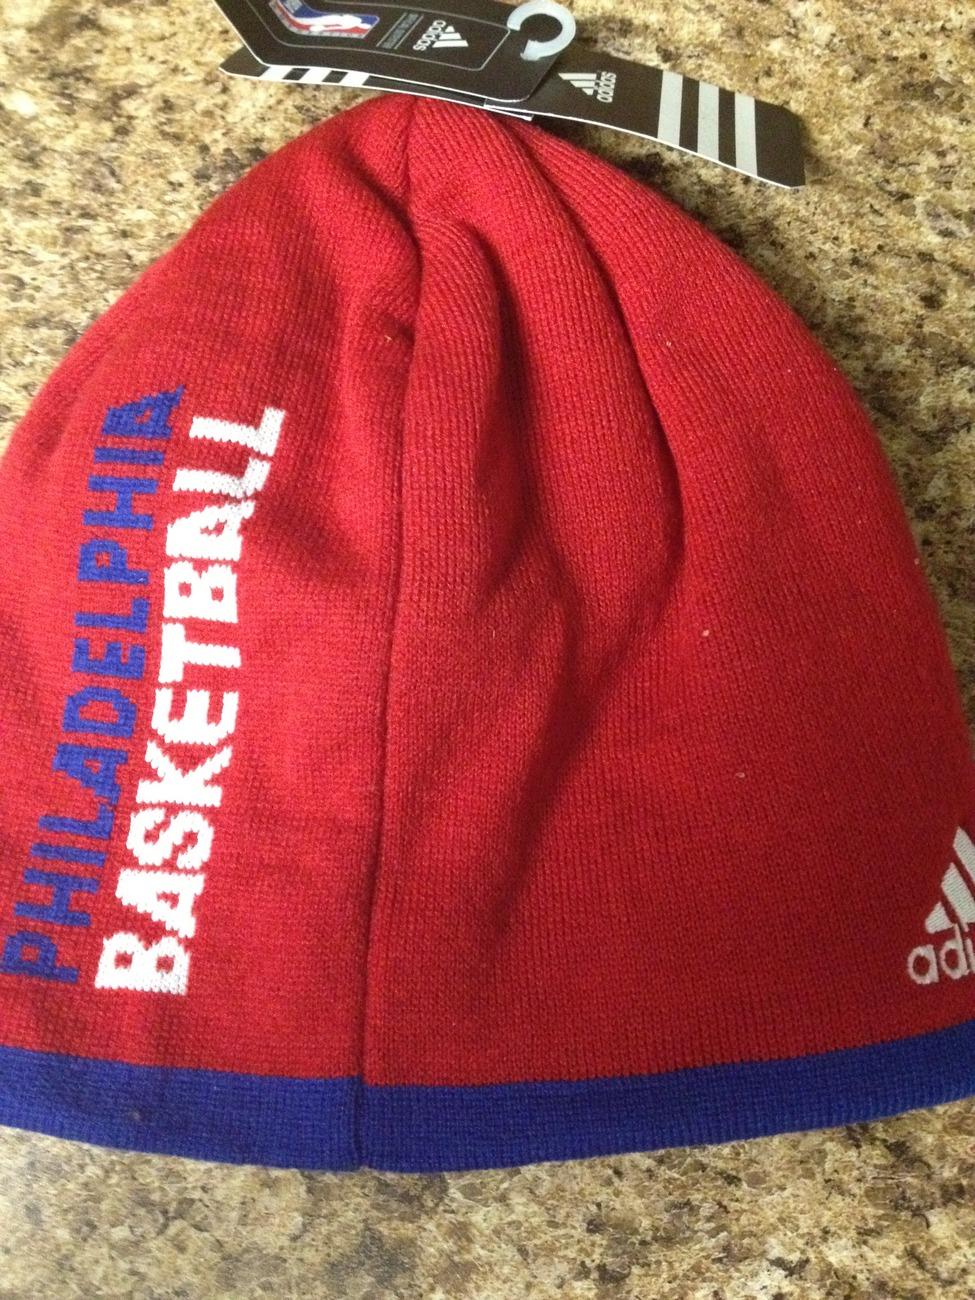 Philadelphia 76ers Adidas Knit NWT